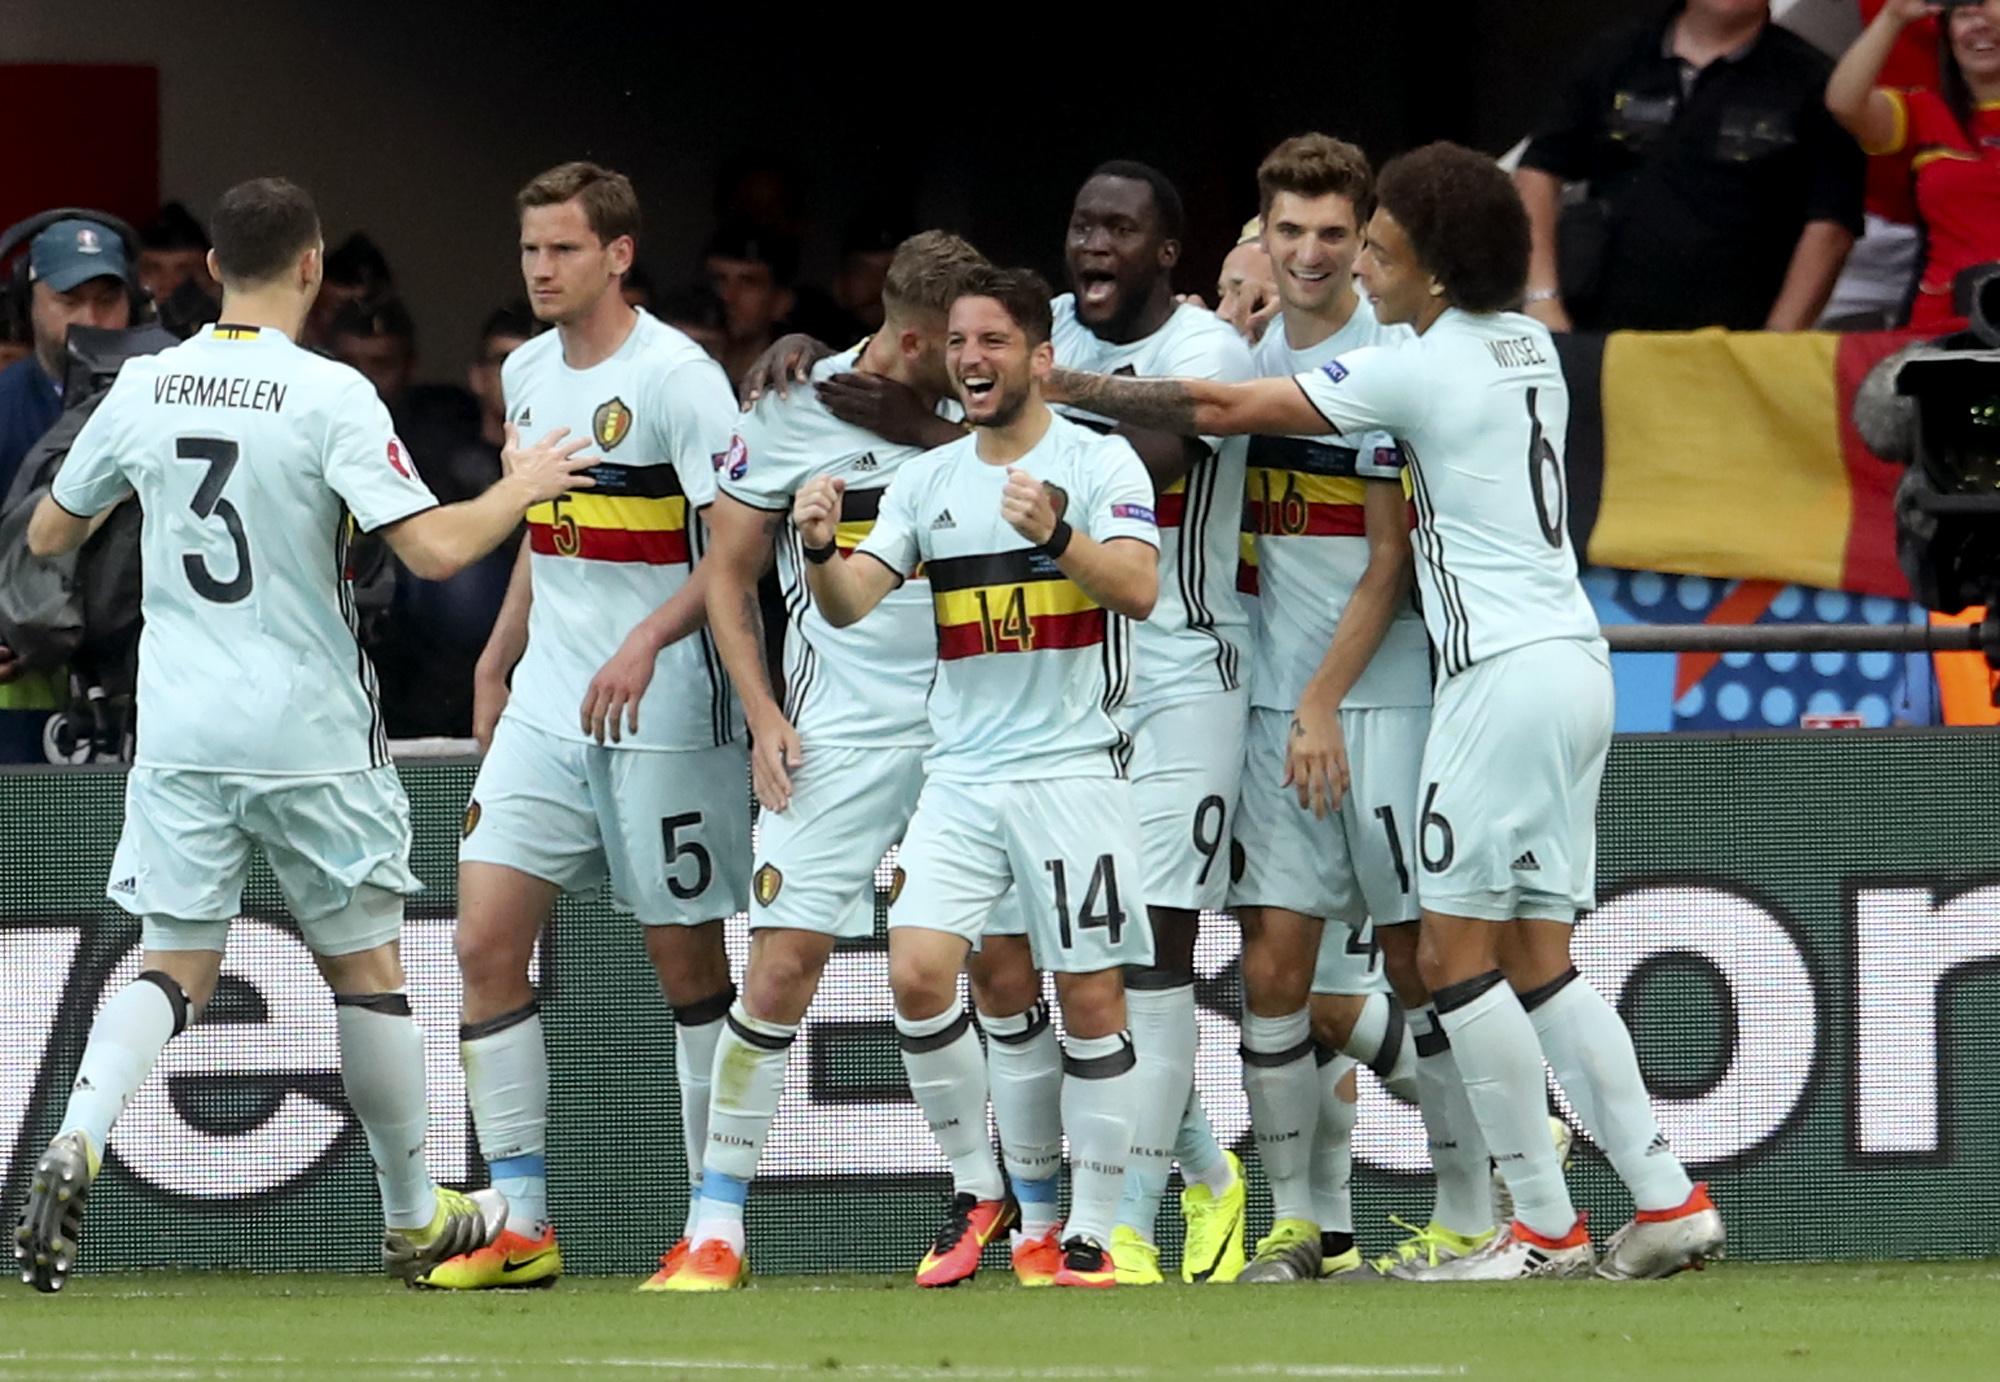 UNGARIA - BELGIA 0-4. Dezlantuiti, belgienii s-au calificat la scor in sferturile UEFA EURO 2016. REZUMAT VIDEO